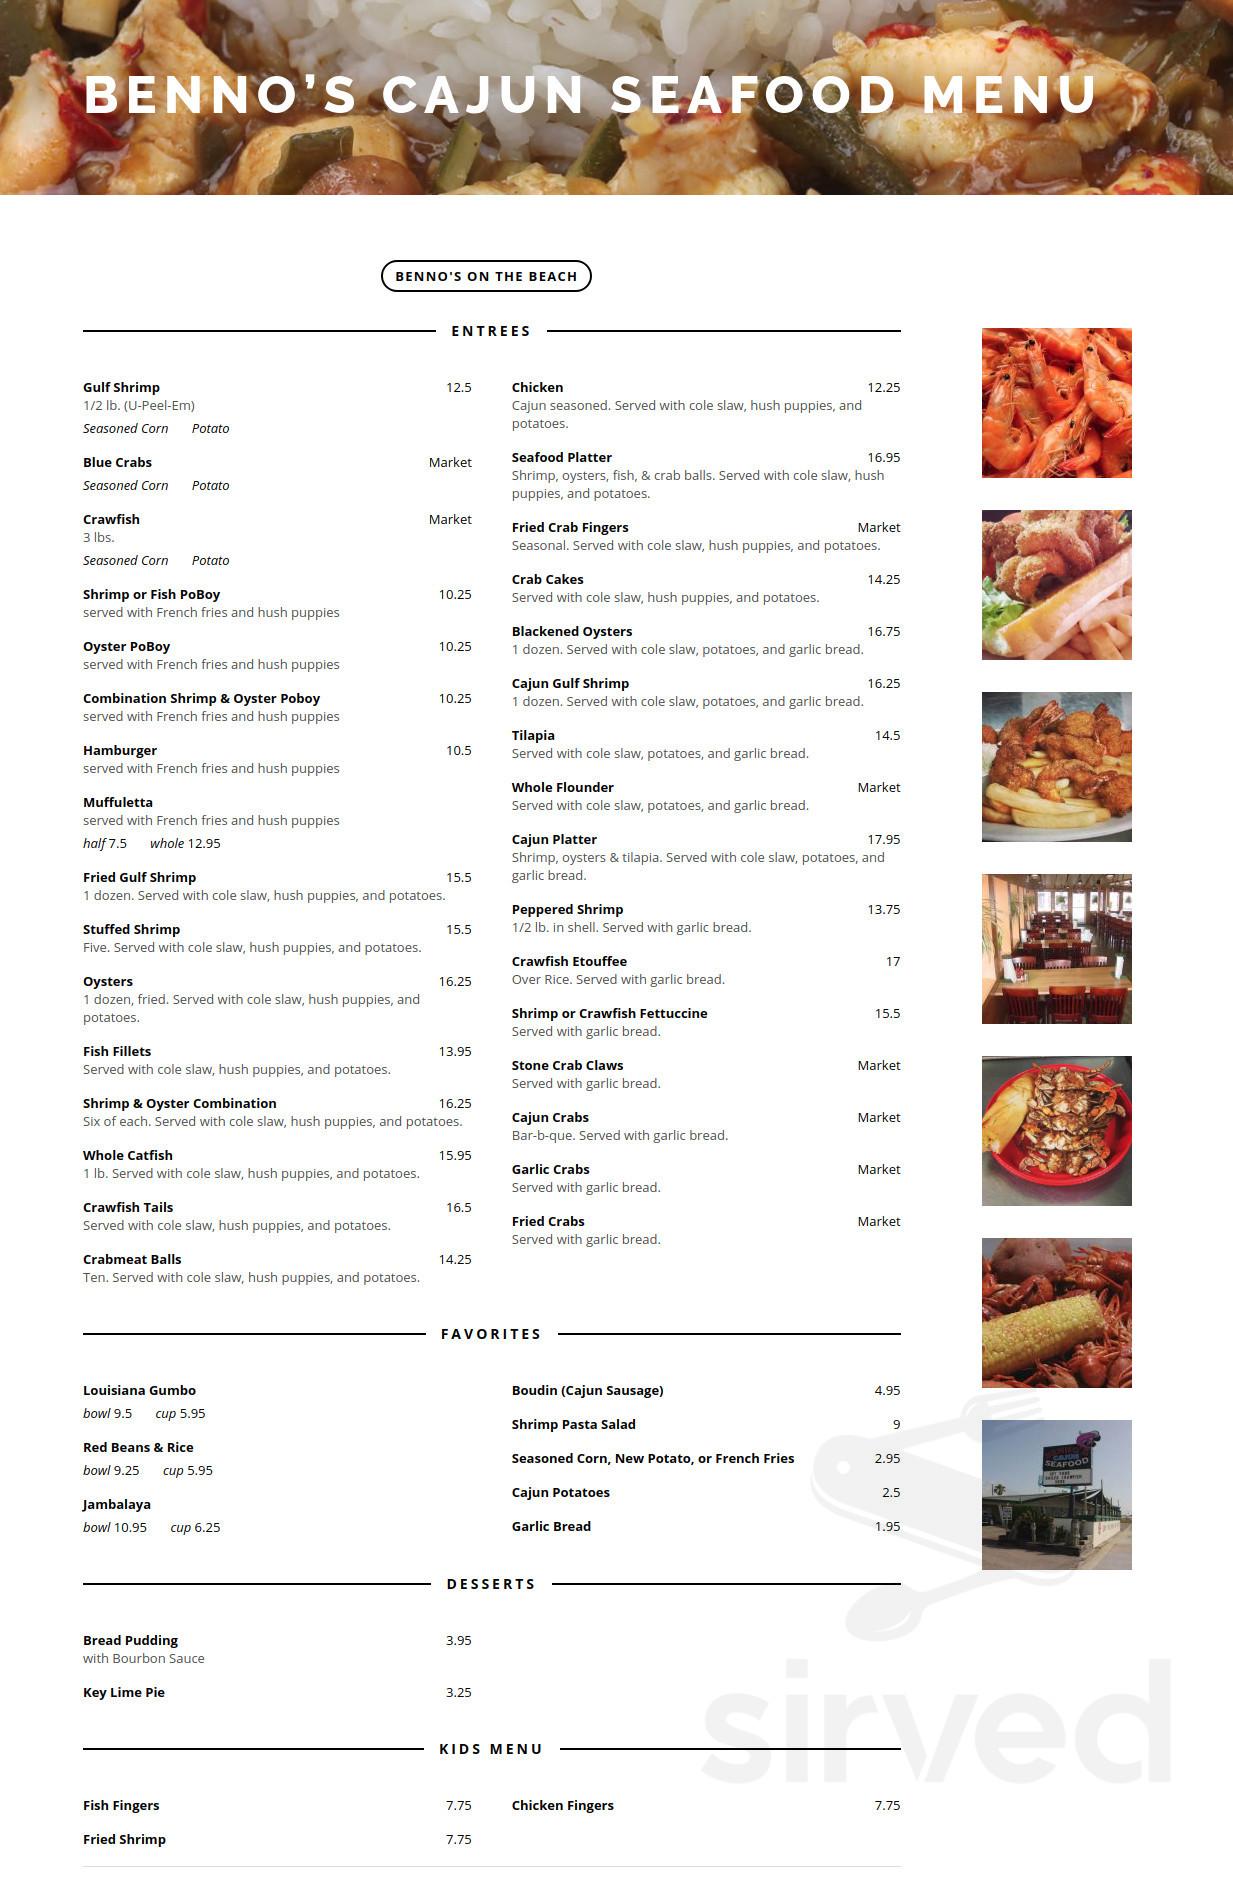 Menu For Benno S Cajun Seafood Restaurant In Galveston Texas